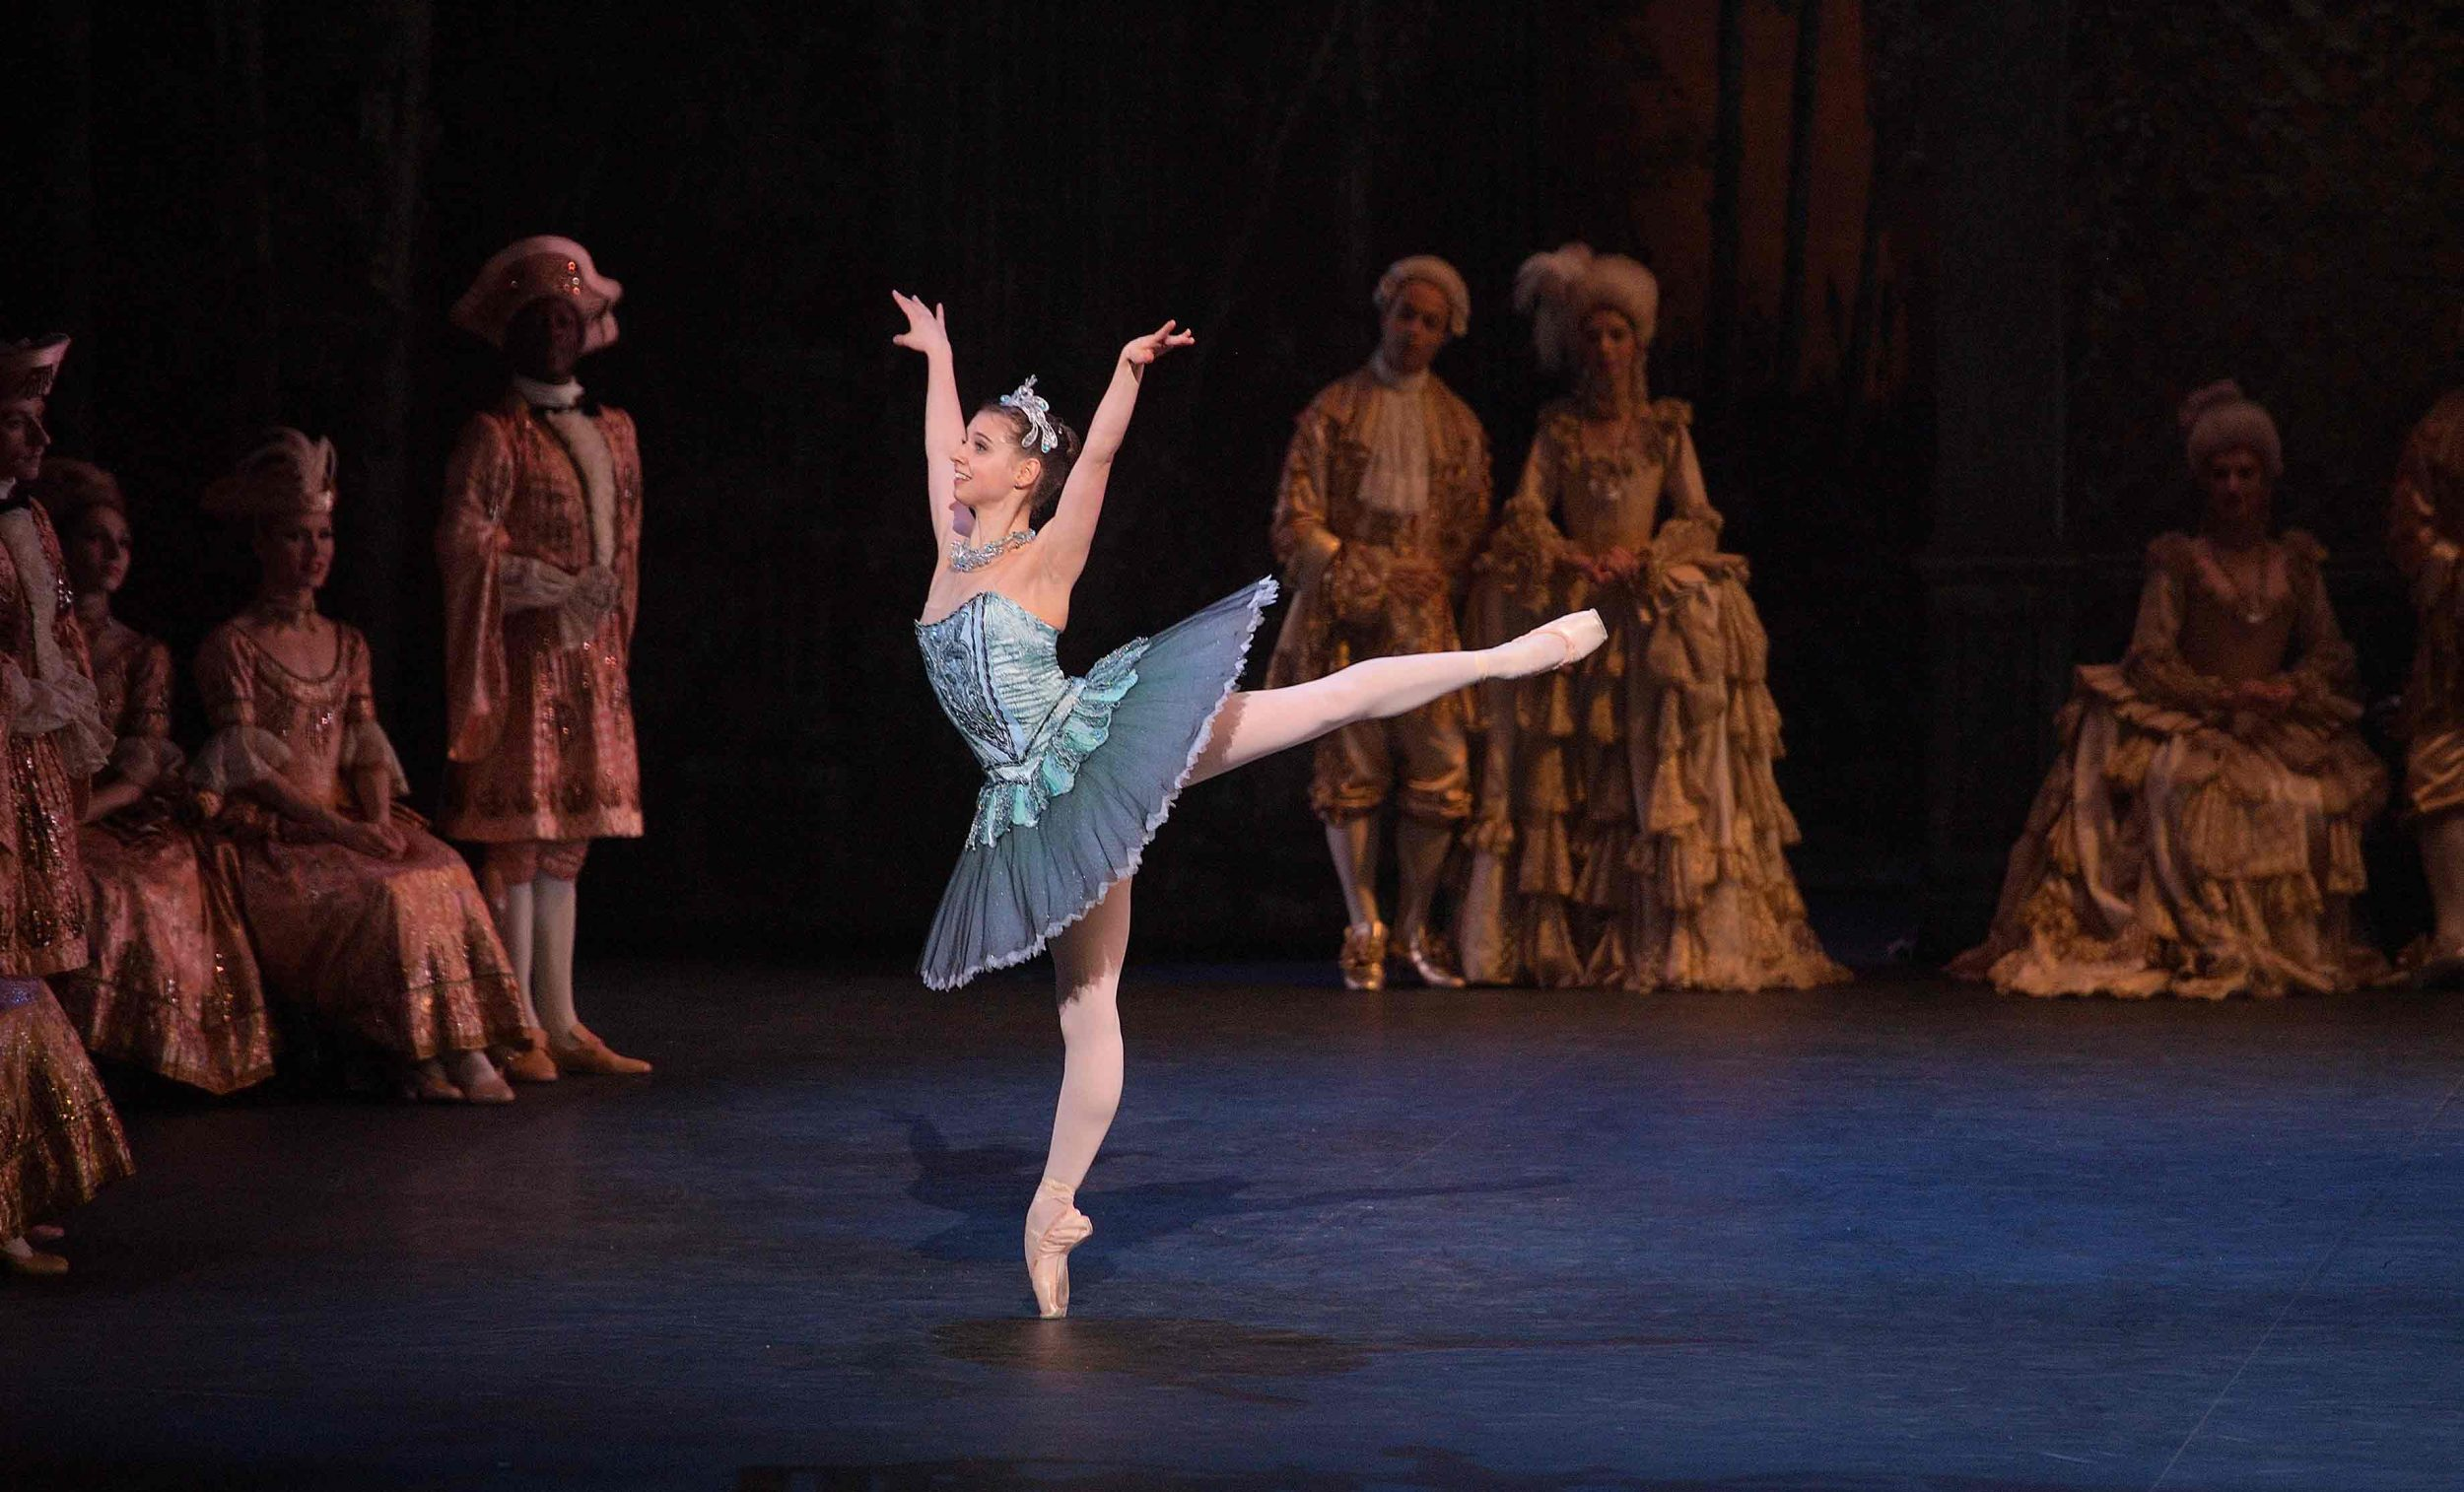 Julia-Conway-as-Princess-Florine-in-The-Sleeping-Beauty-©-Laurent-Liotardo-(3)_WEB